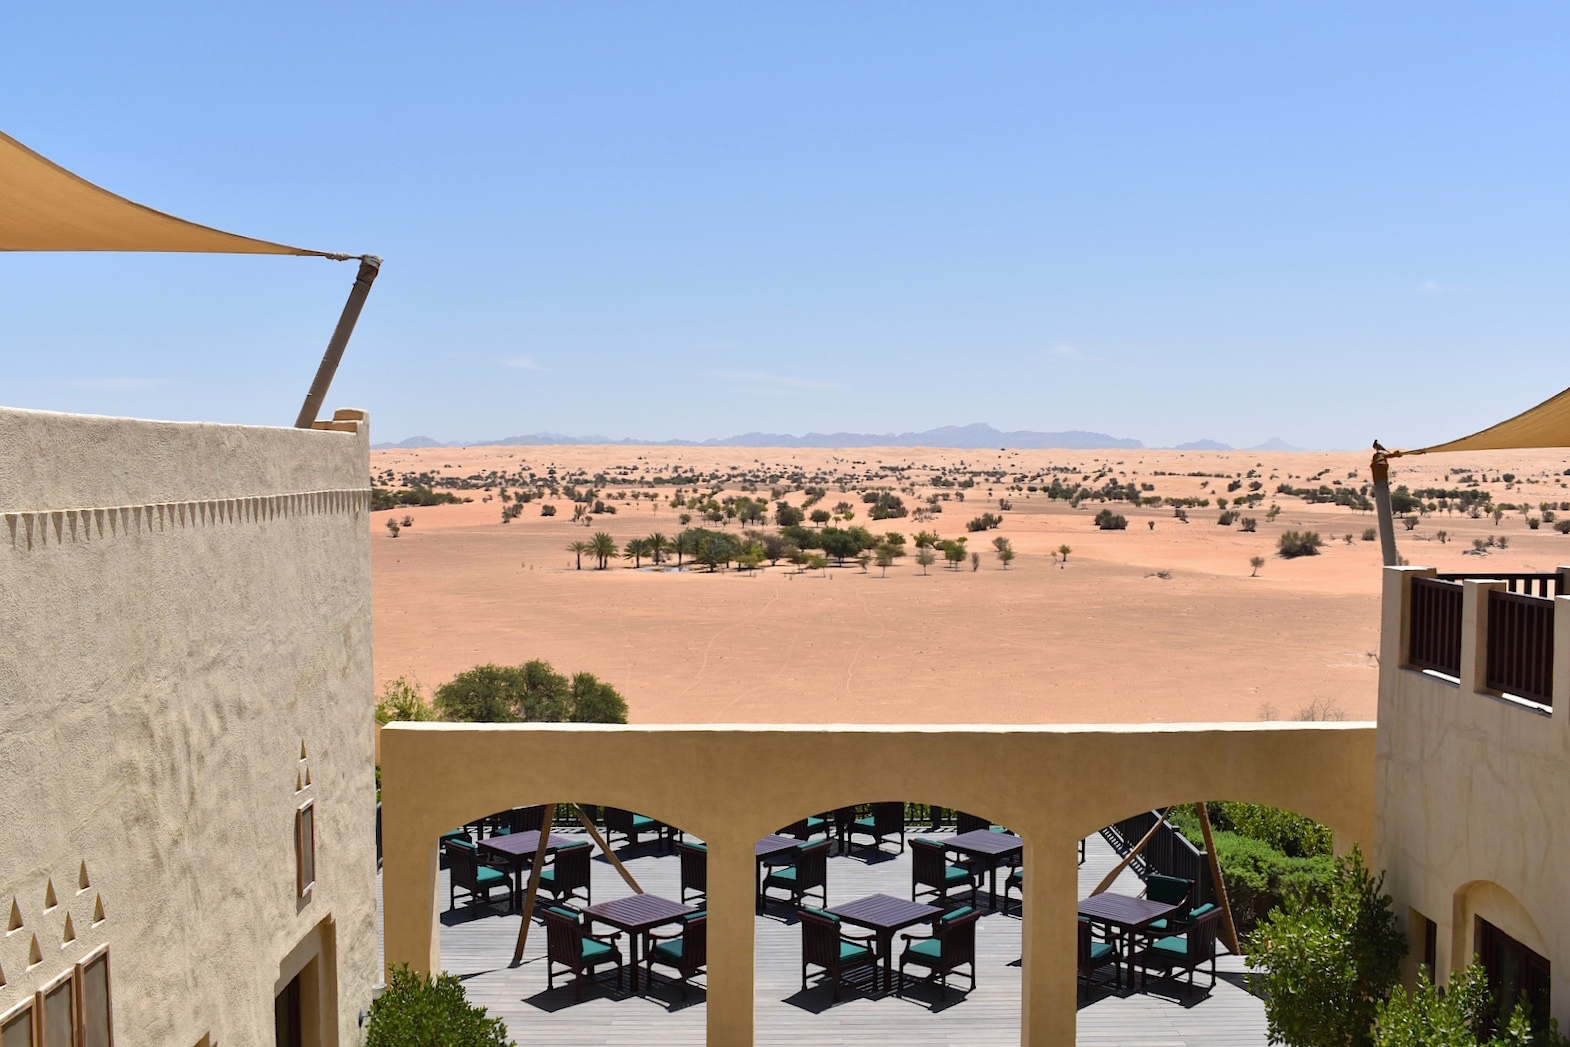 DESERT ESCAPE TO AL MAHA RESORT & SPA, DUBAI